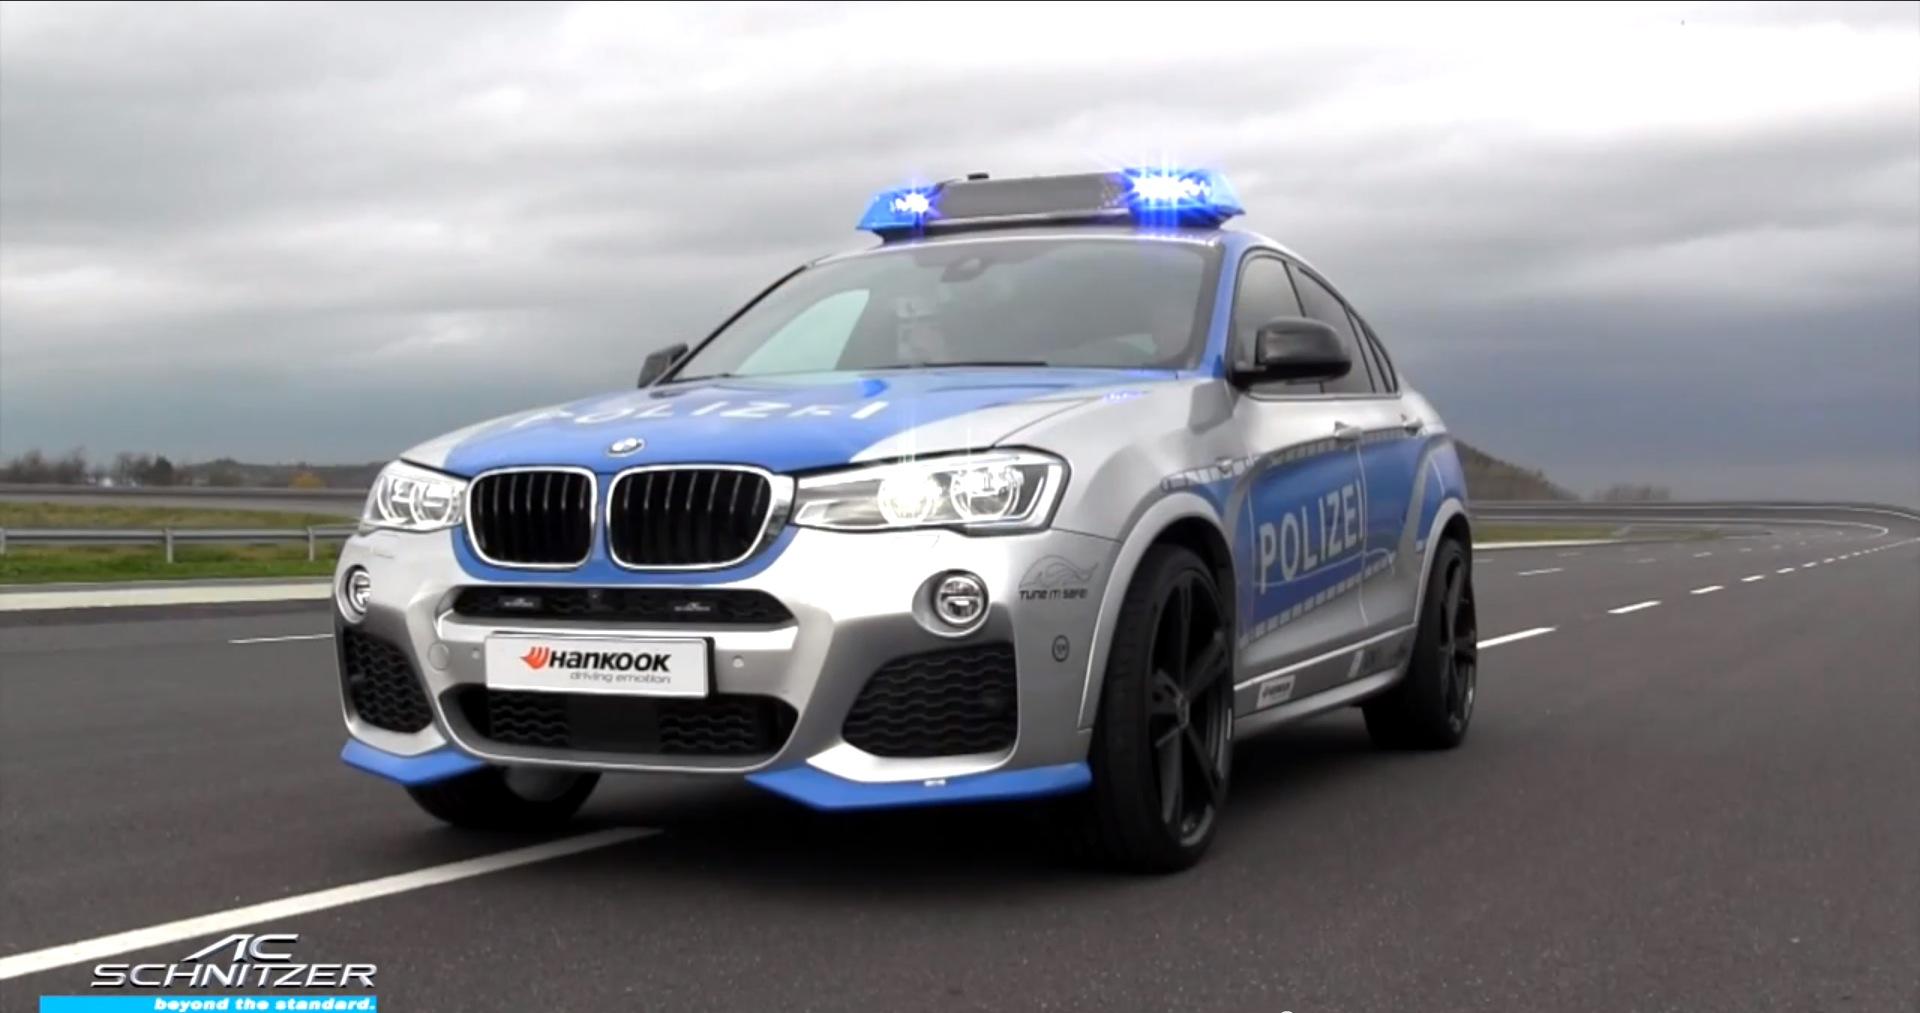 AC Schnitzer X4 Police Car Debuts at 2014 Essen Moto Show  BMW X4